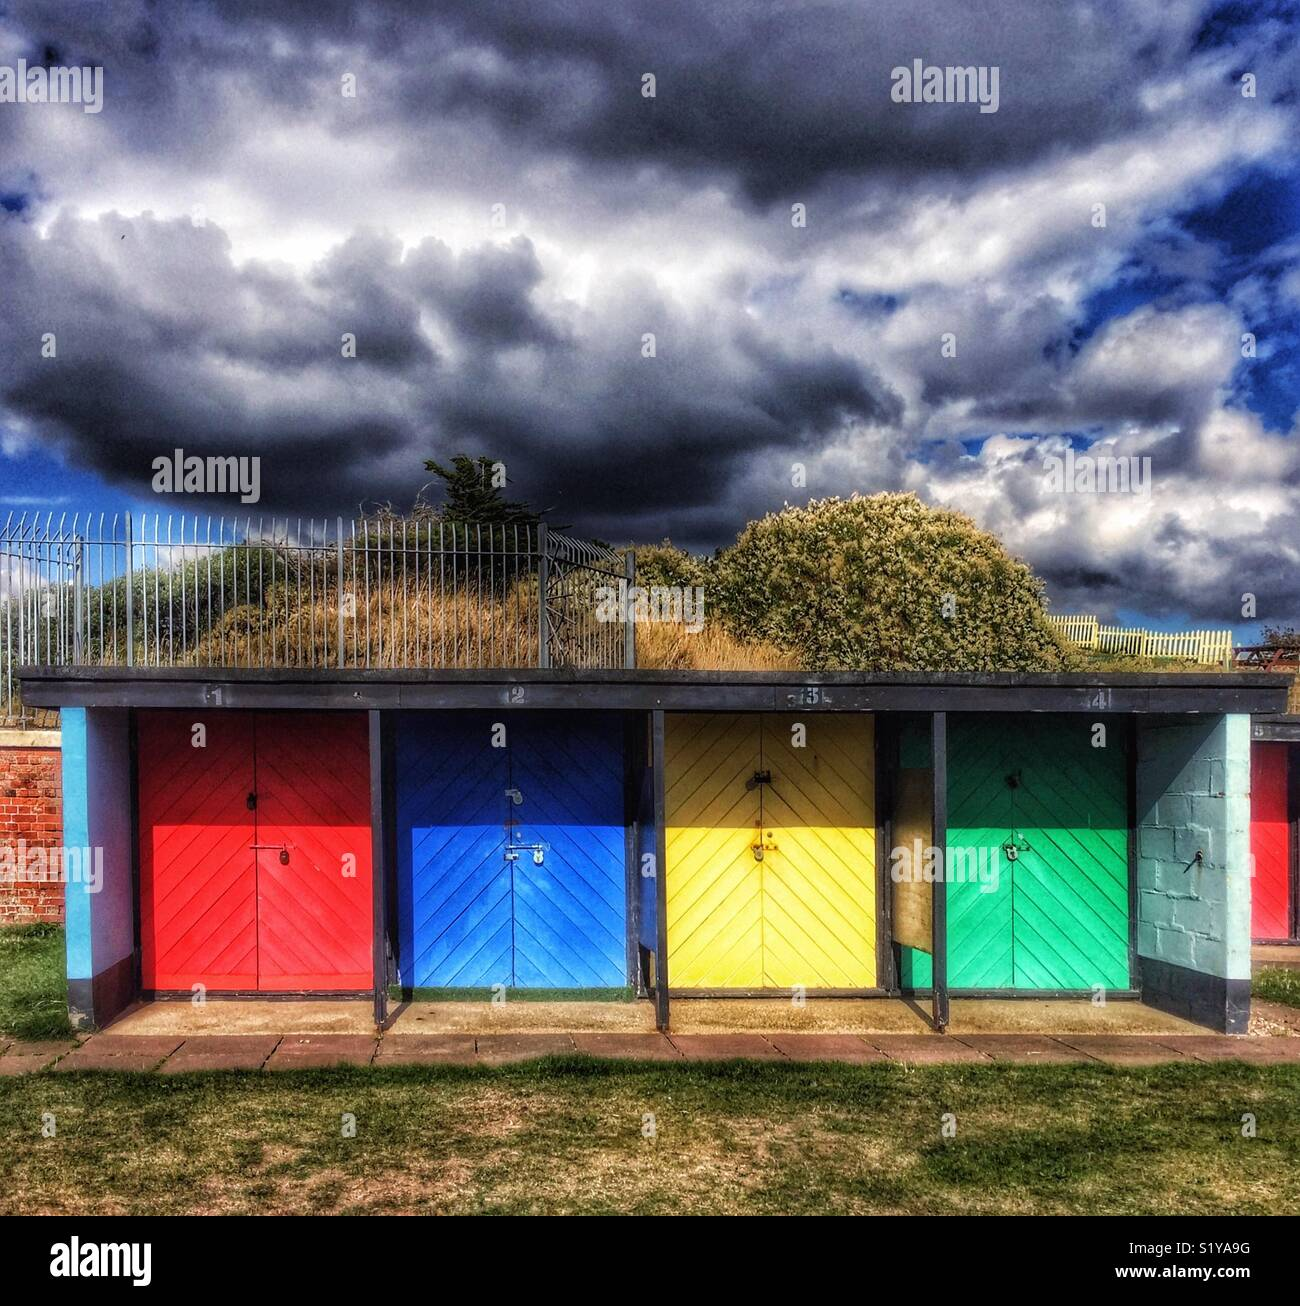 Beach huts, Southsea, Portsmouth, Hampshire, England, UK Stock Photo